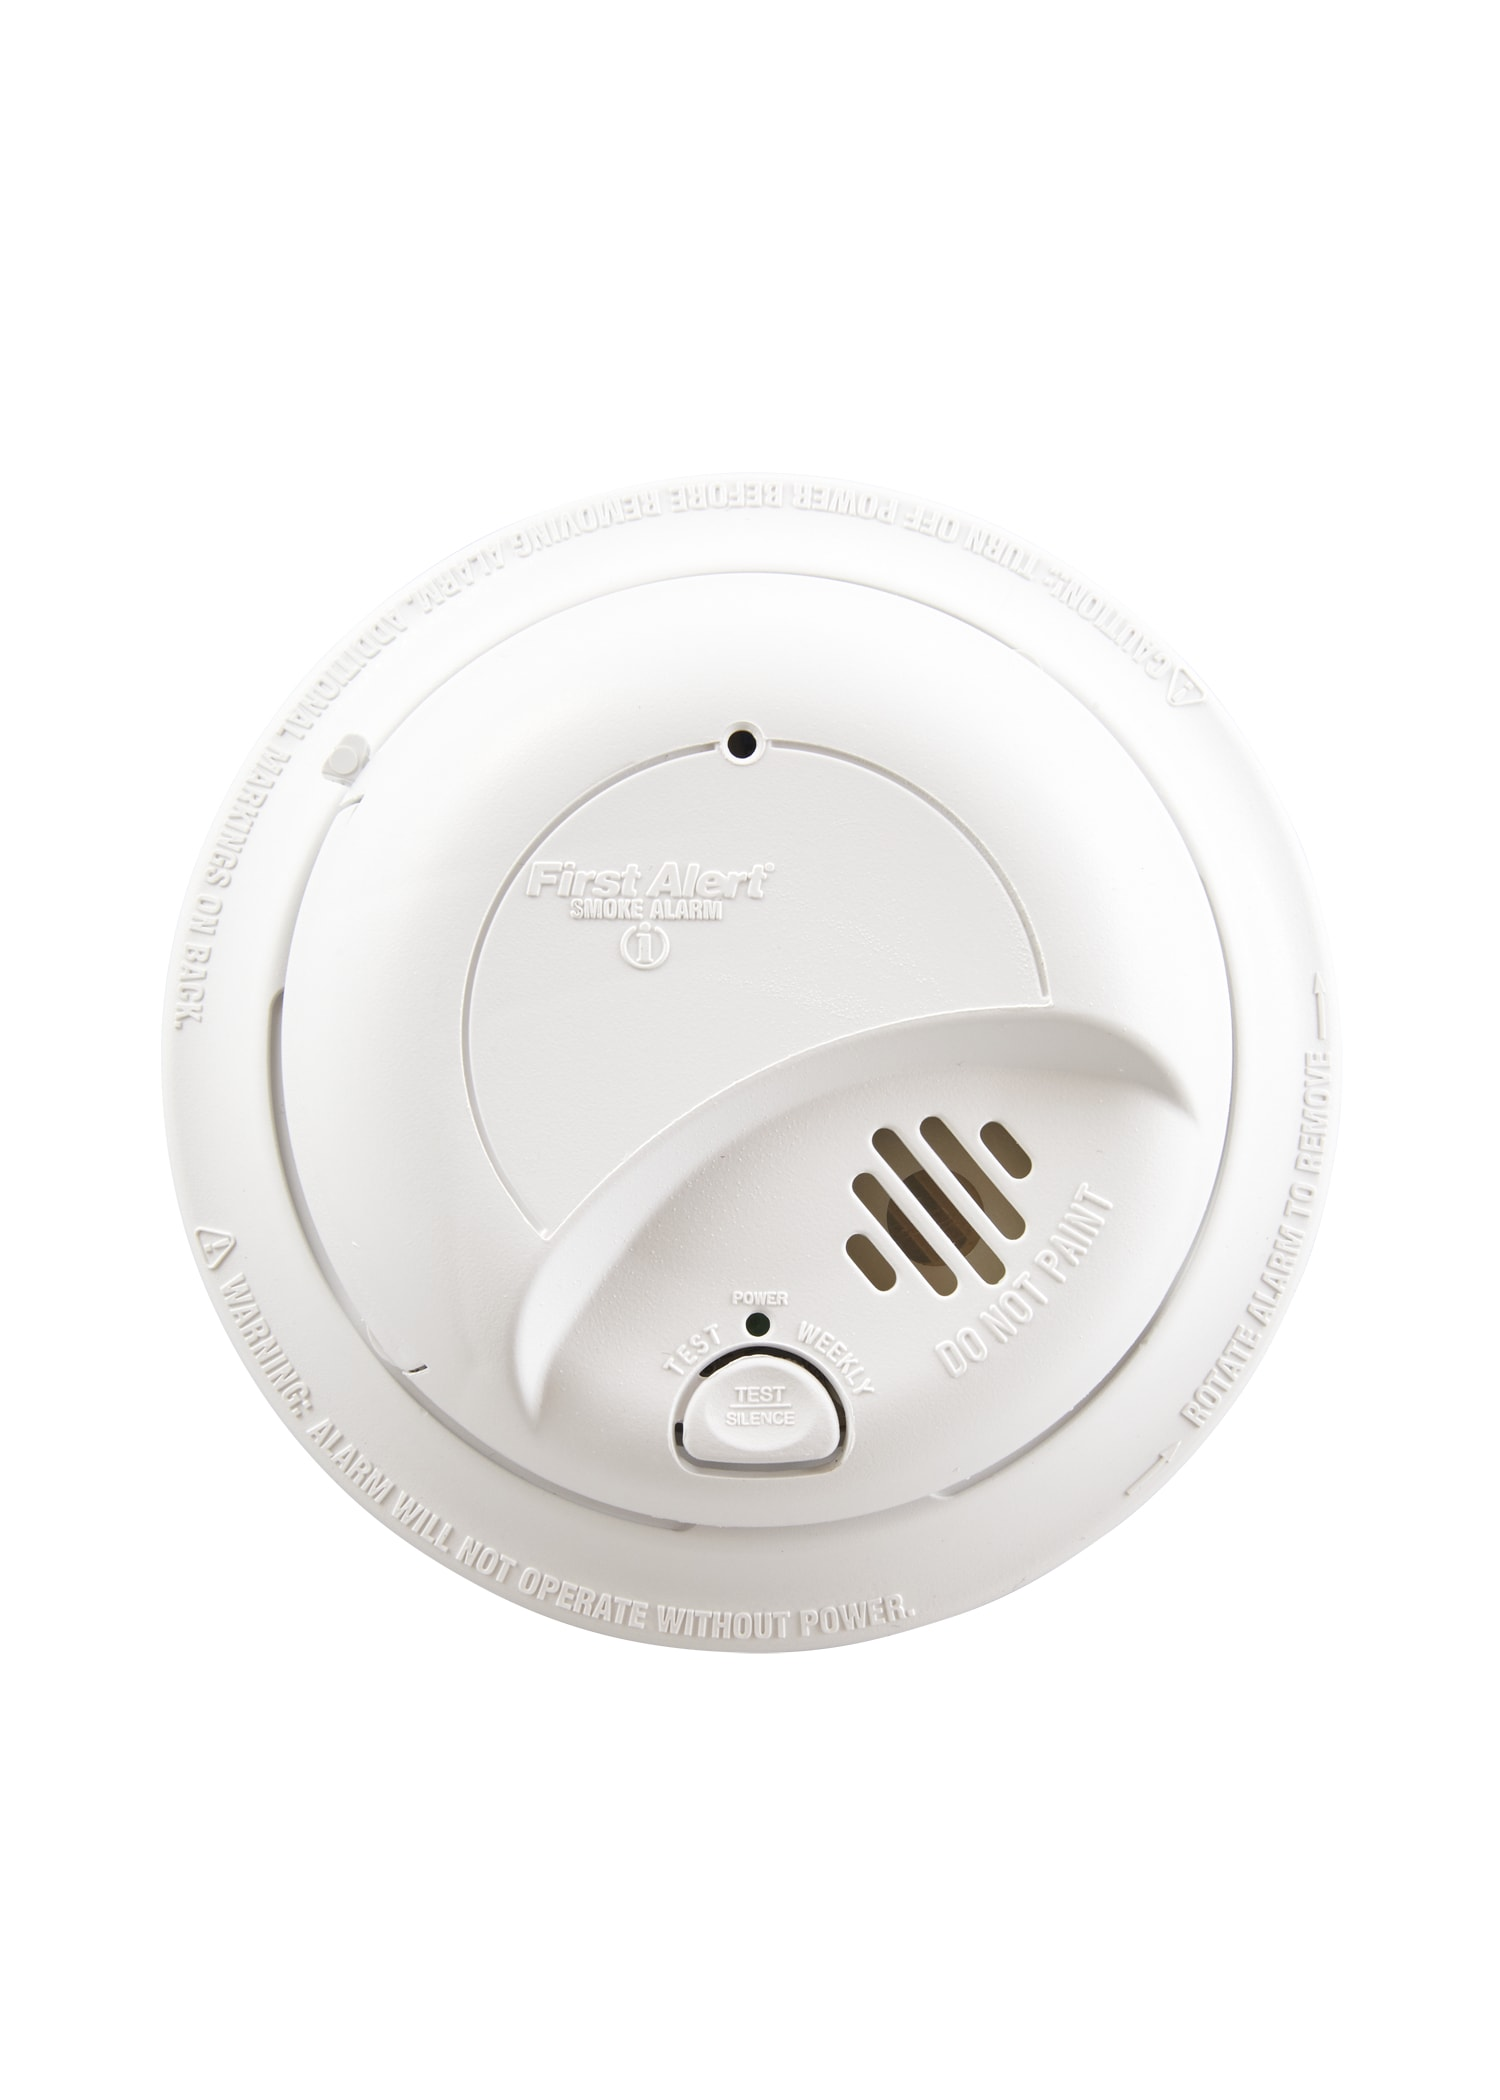 hight resolution of first alert sa9120bpcn 120v ac hardwired smoke alarm with adapter plugs walmart com